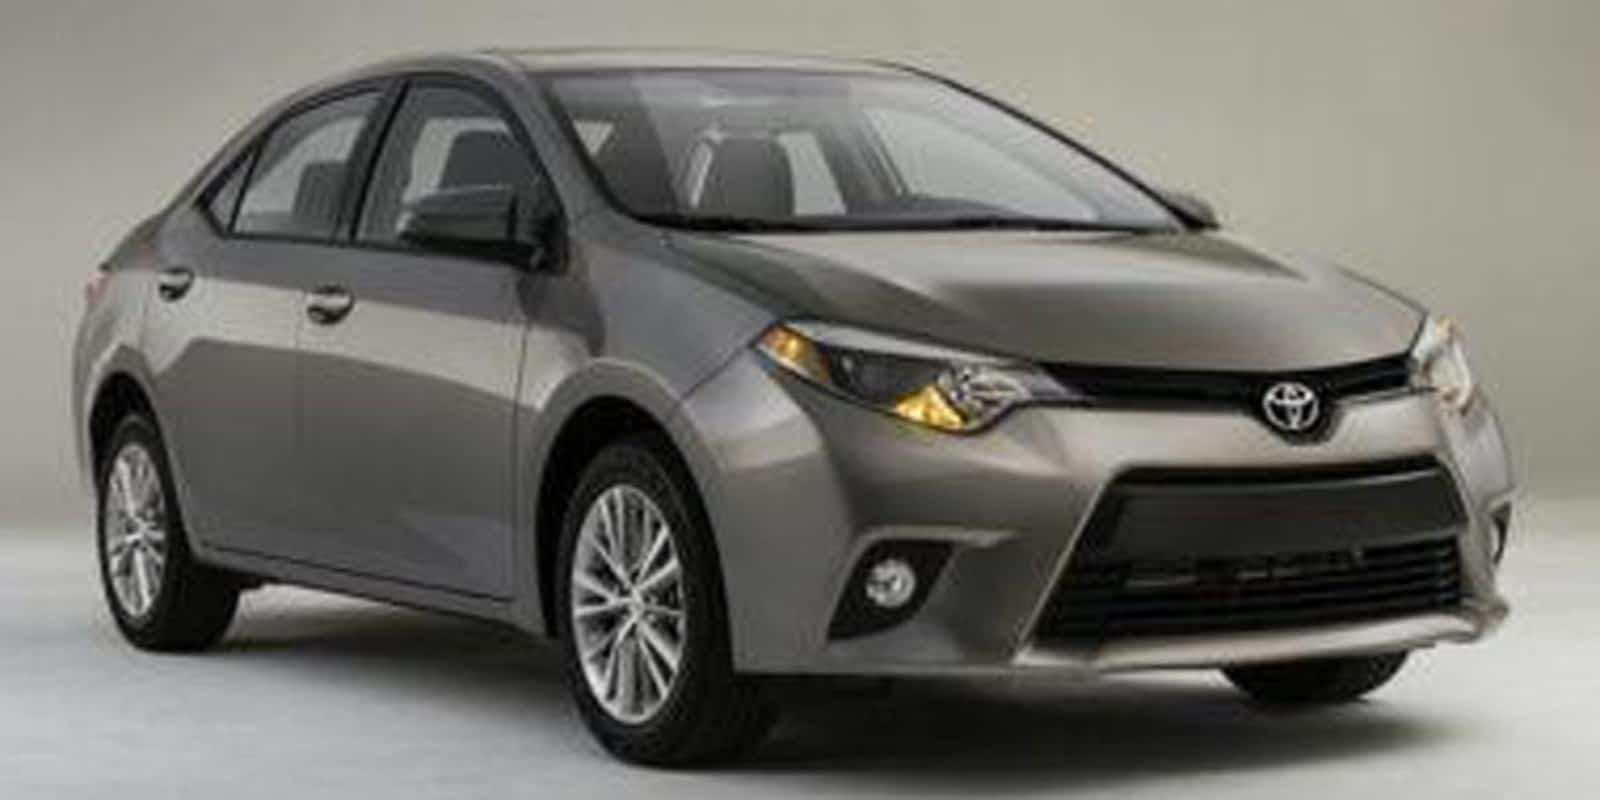 Toyota Of Midland >> Midland Toyota Opening Hours 806 King Street Box 12